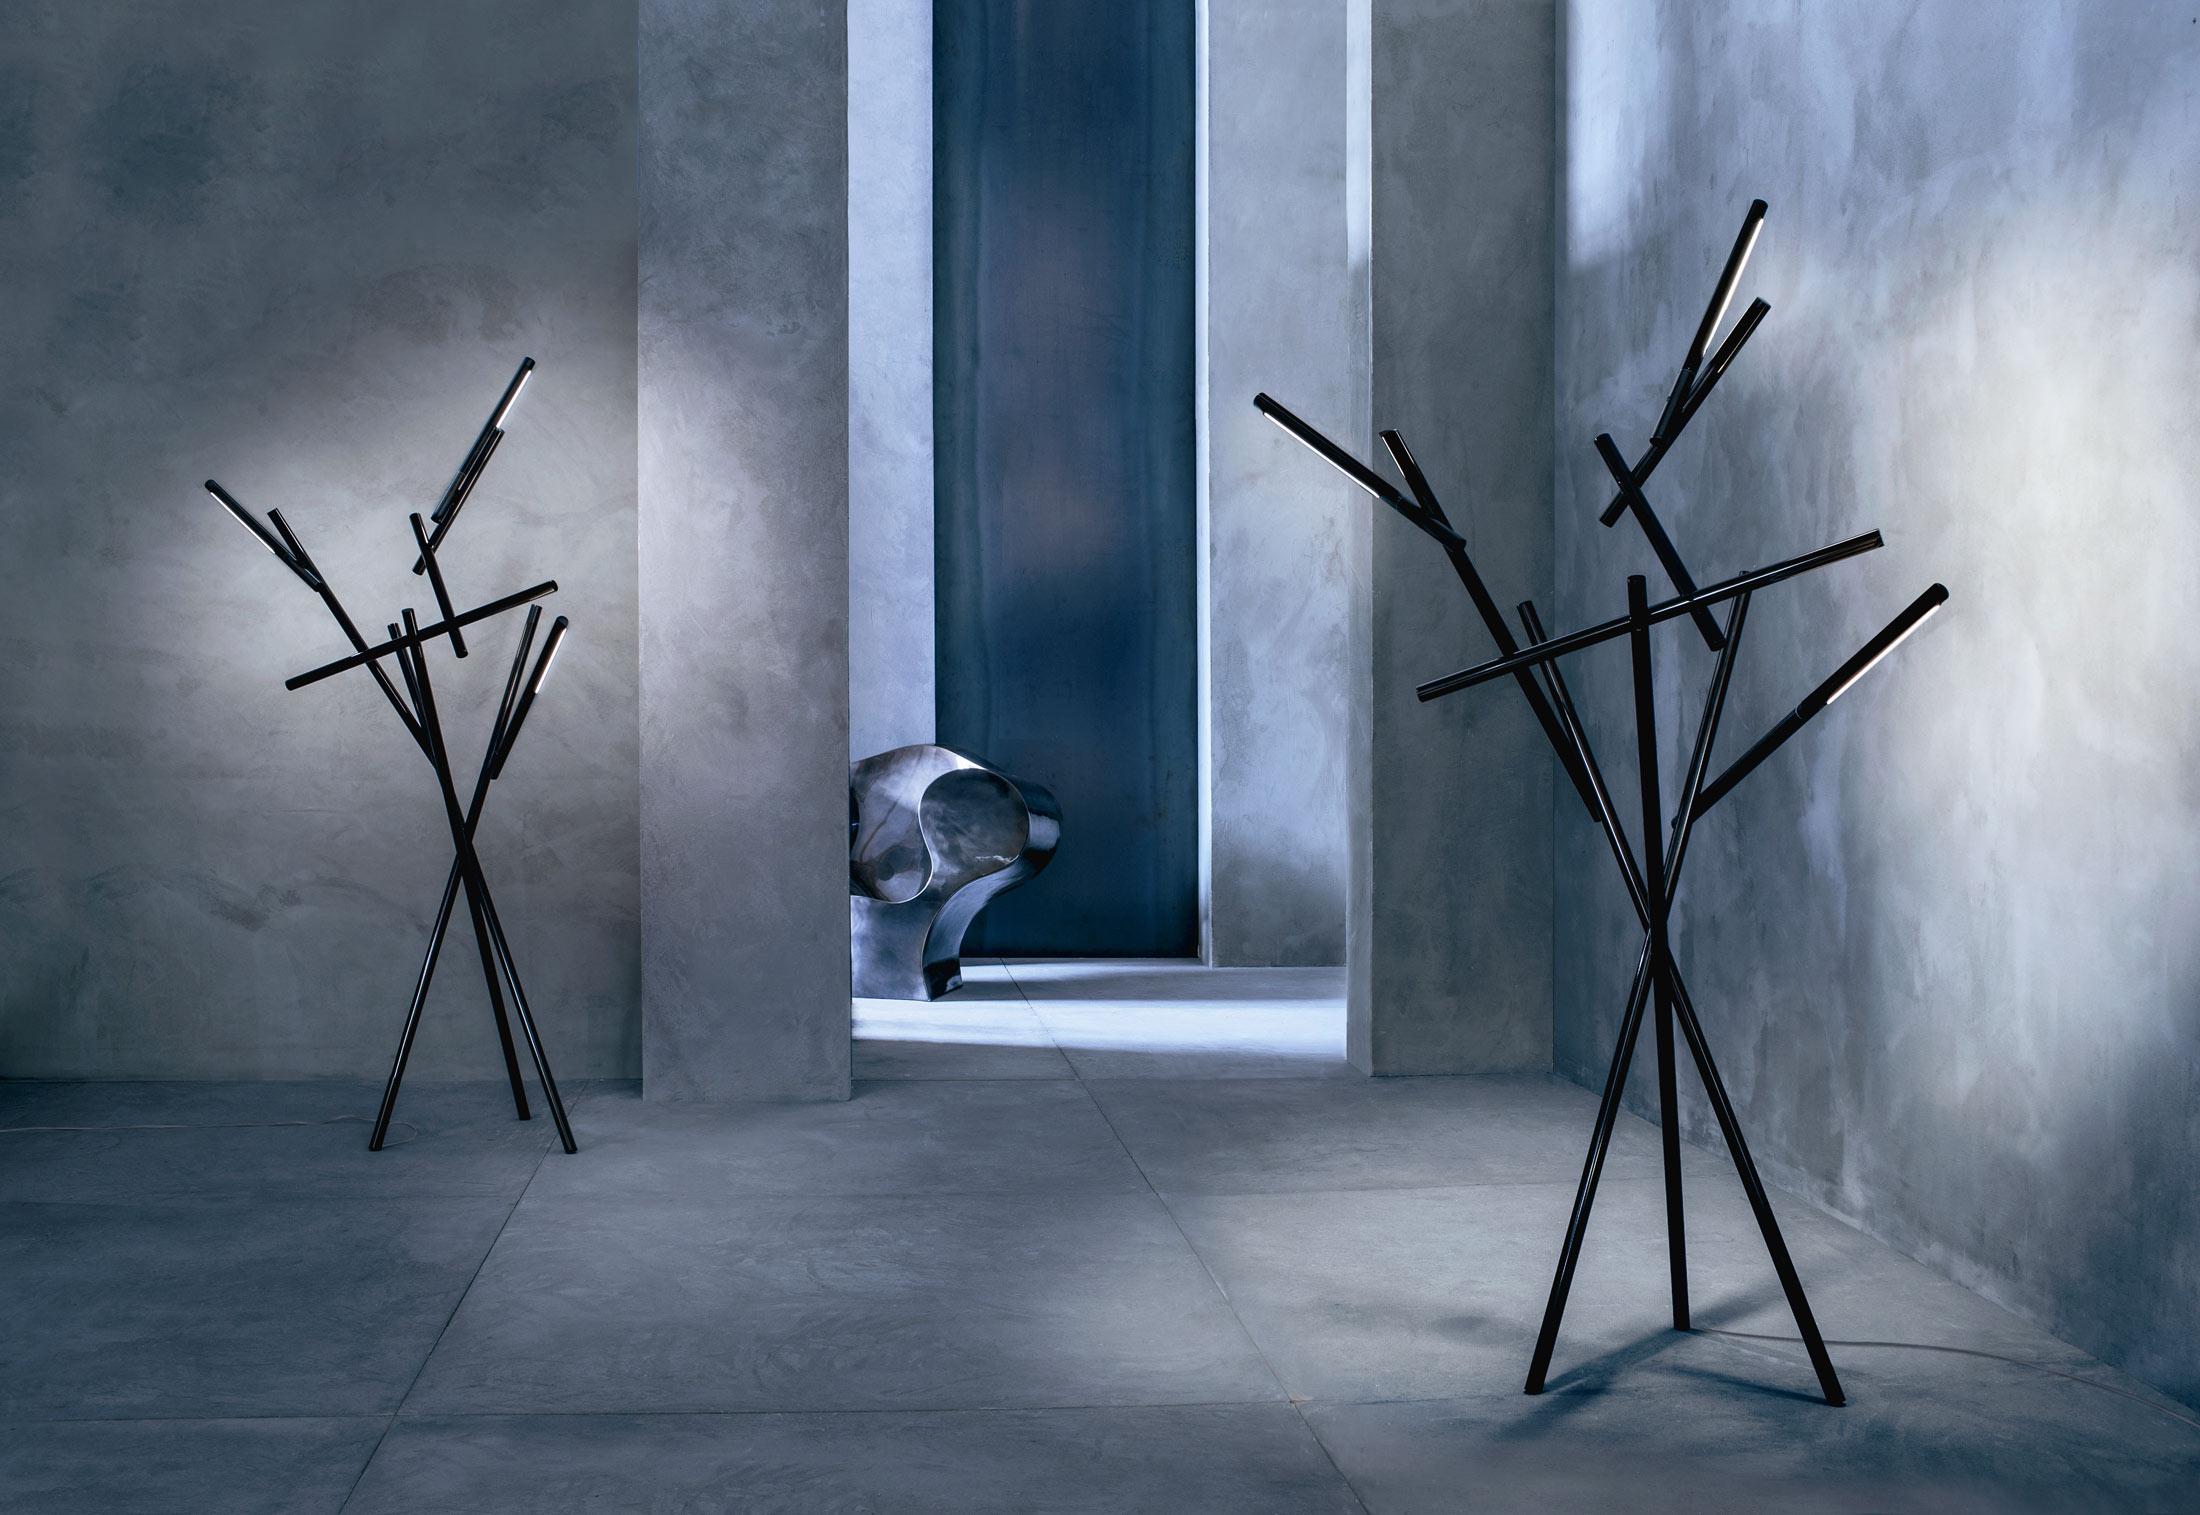 foscarini tuareg l mpara von stehlampe orange 255003 53. Black Bedroom Furniture Sets. Home Design Ideas